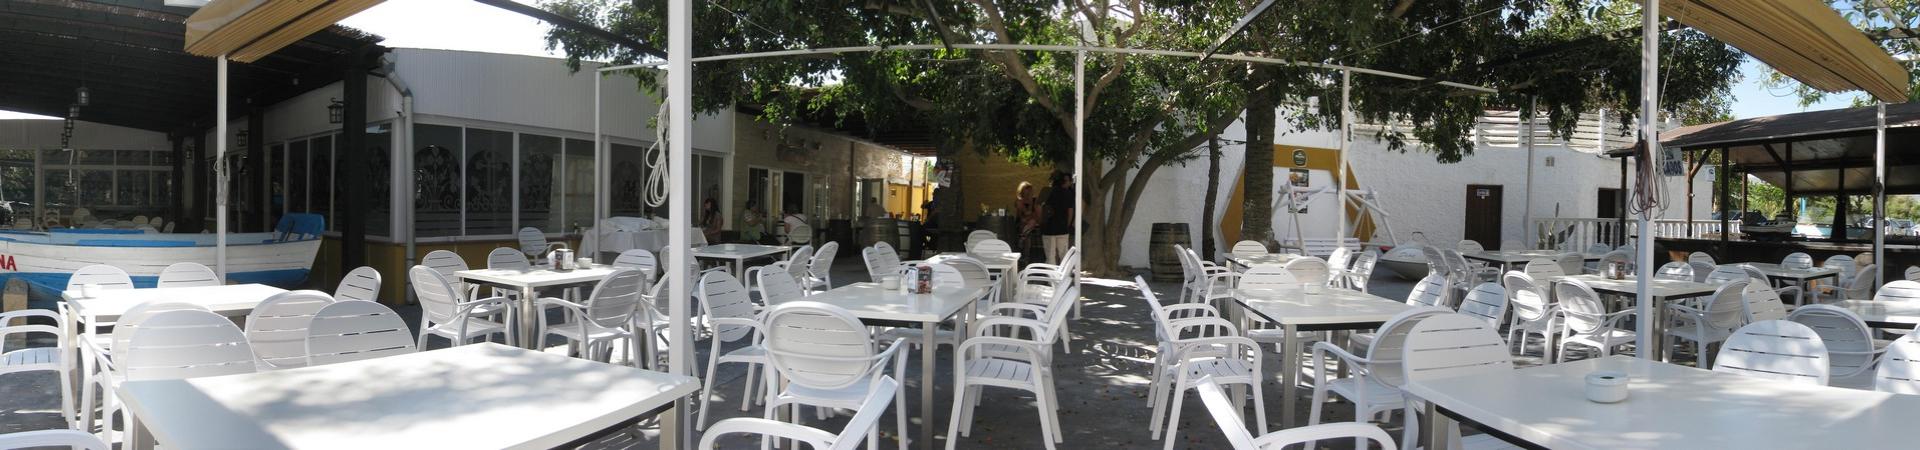 Restaurante Katena en motril, restaurantes en motril, restaurantes motril, restaurantes en salobreña